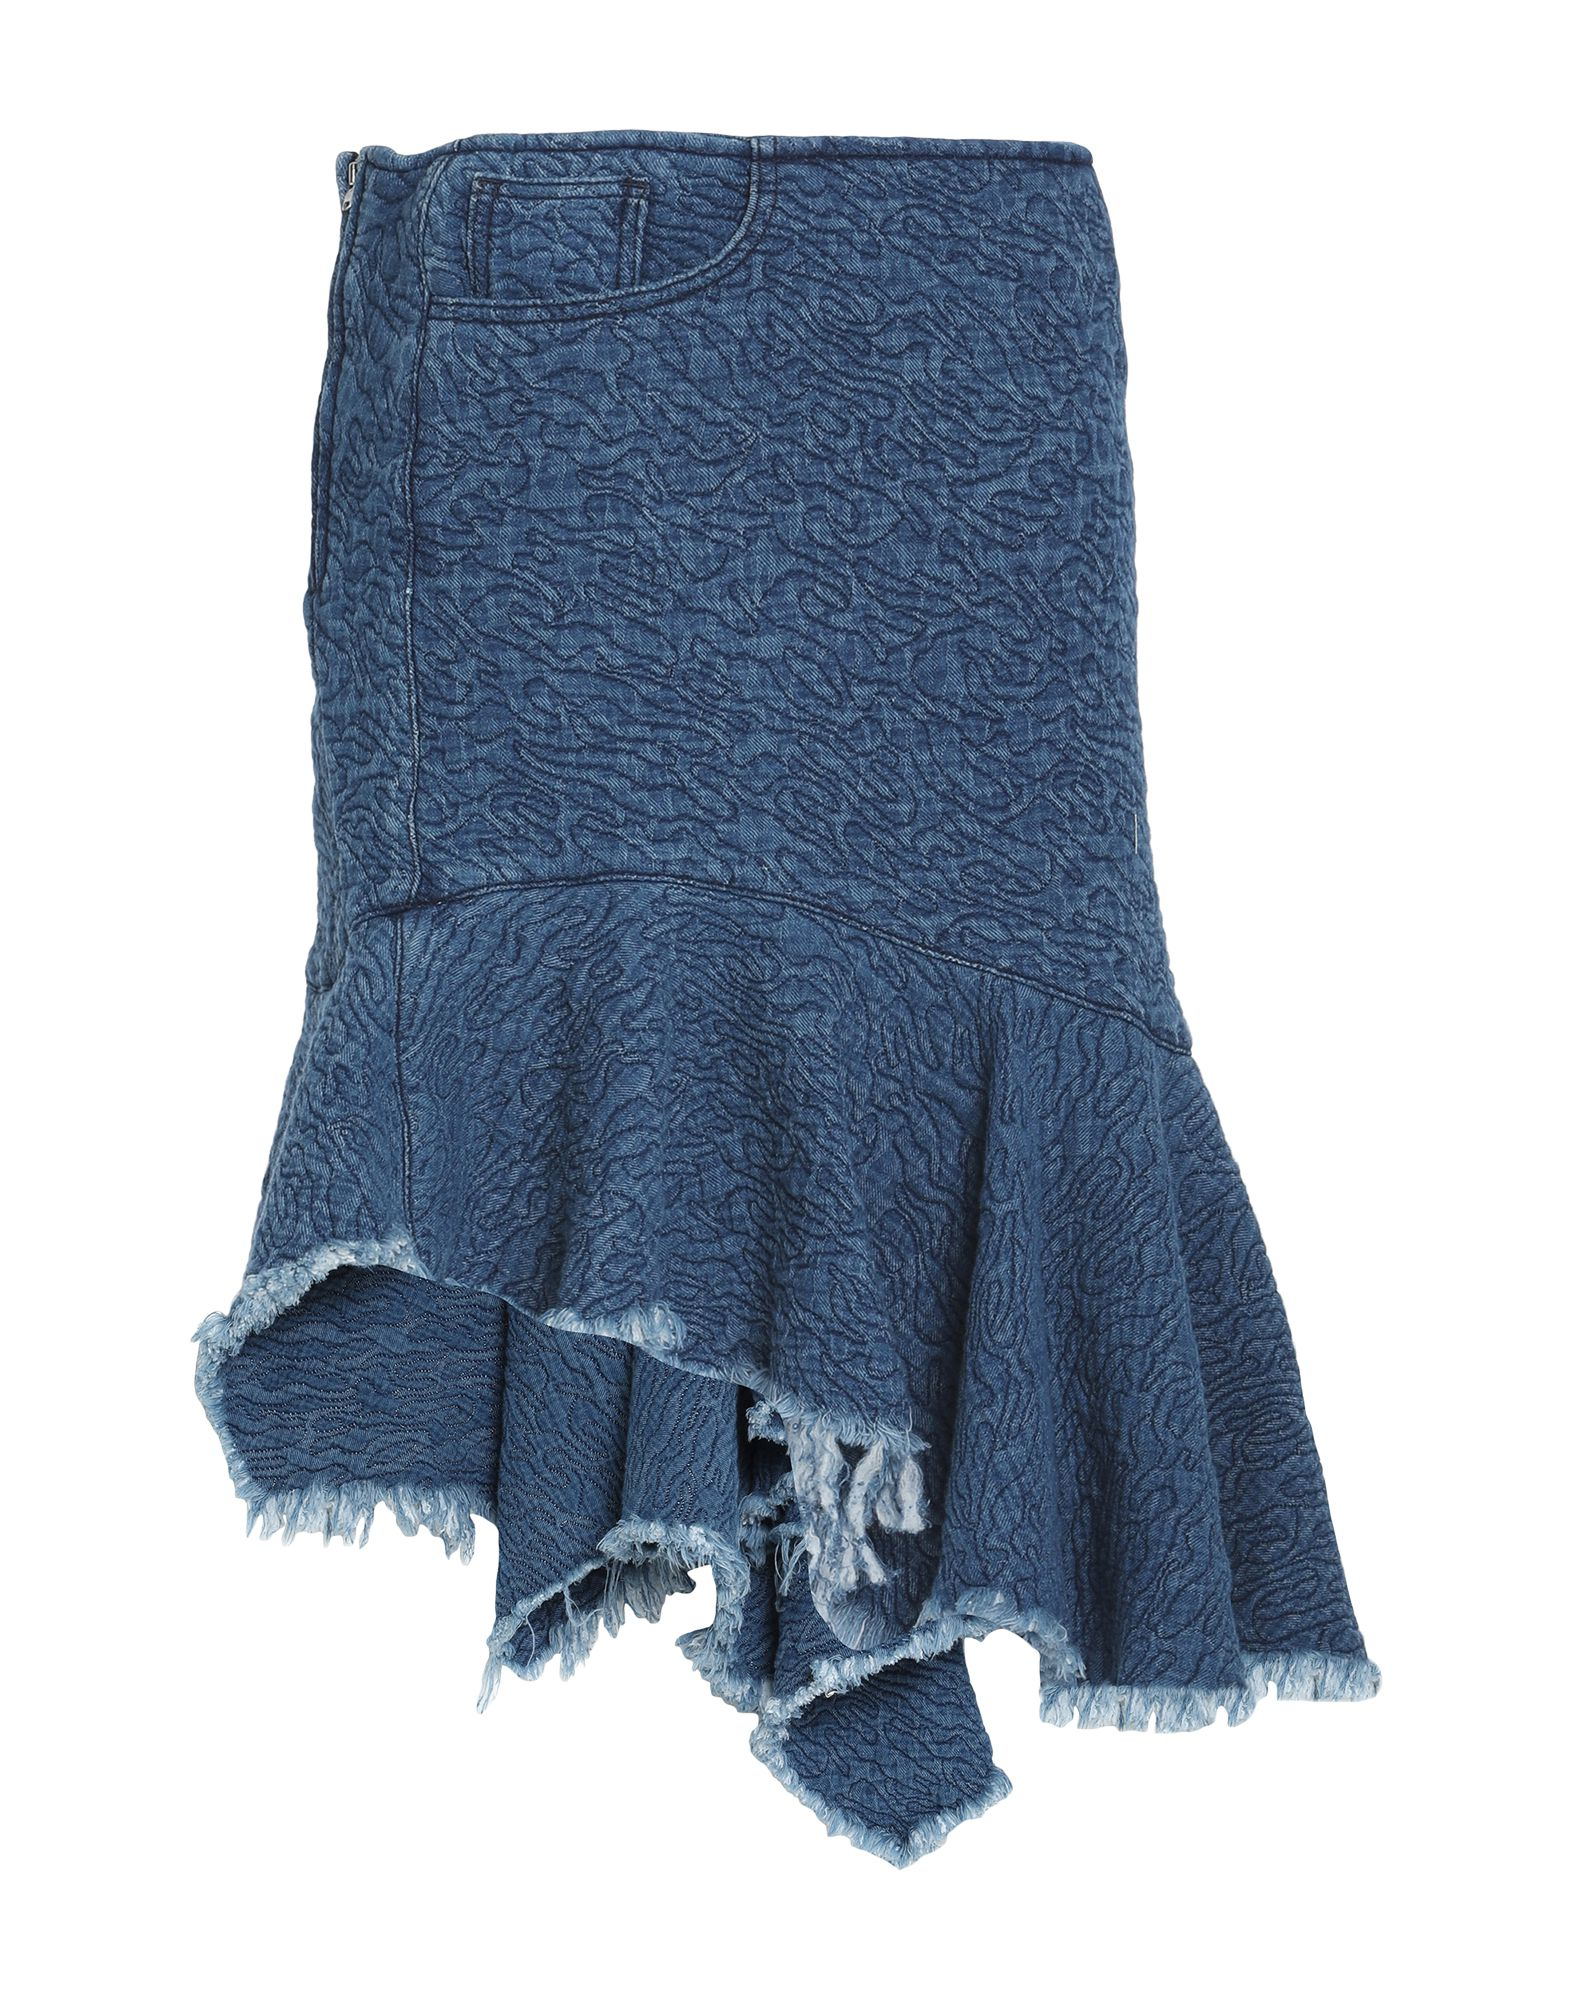 Фото - MARQUES' ALMEIDA Джинсовая юбка marques almeida джинсовая юбка